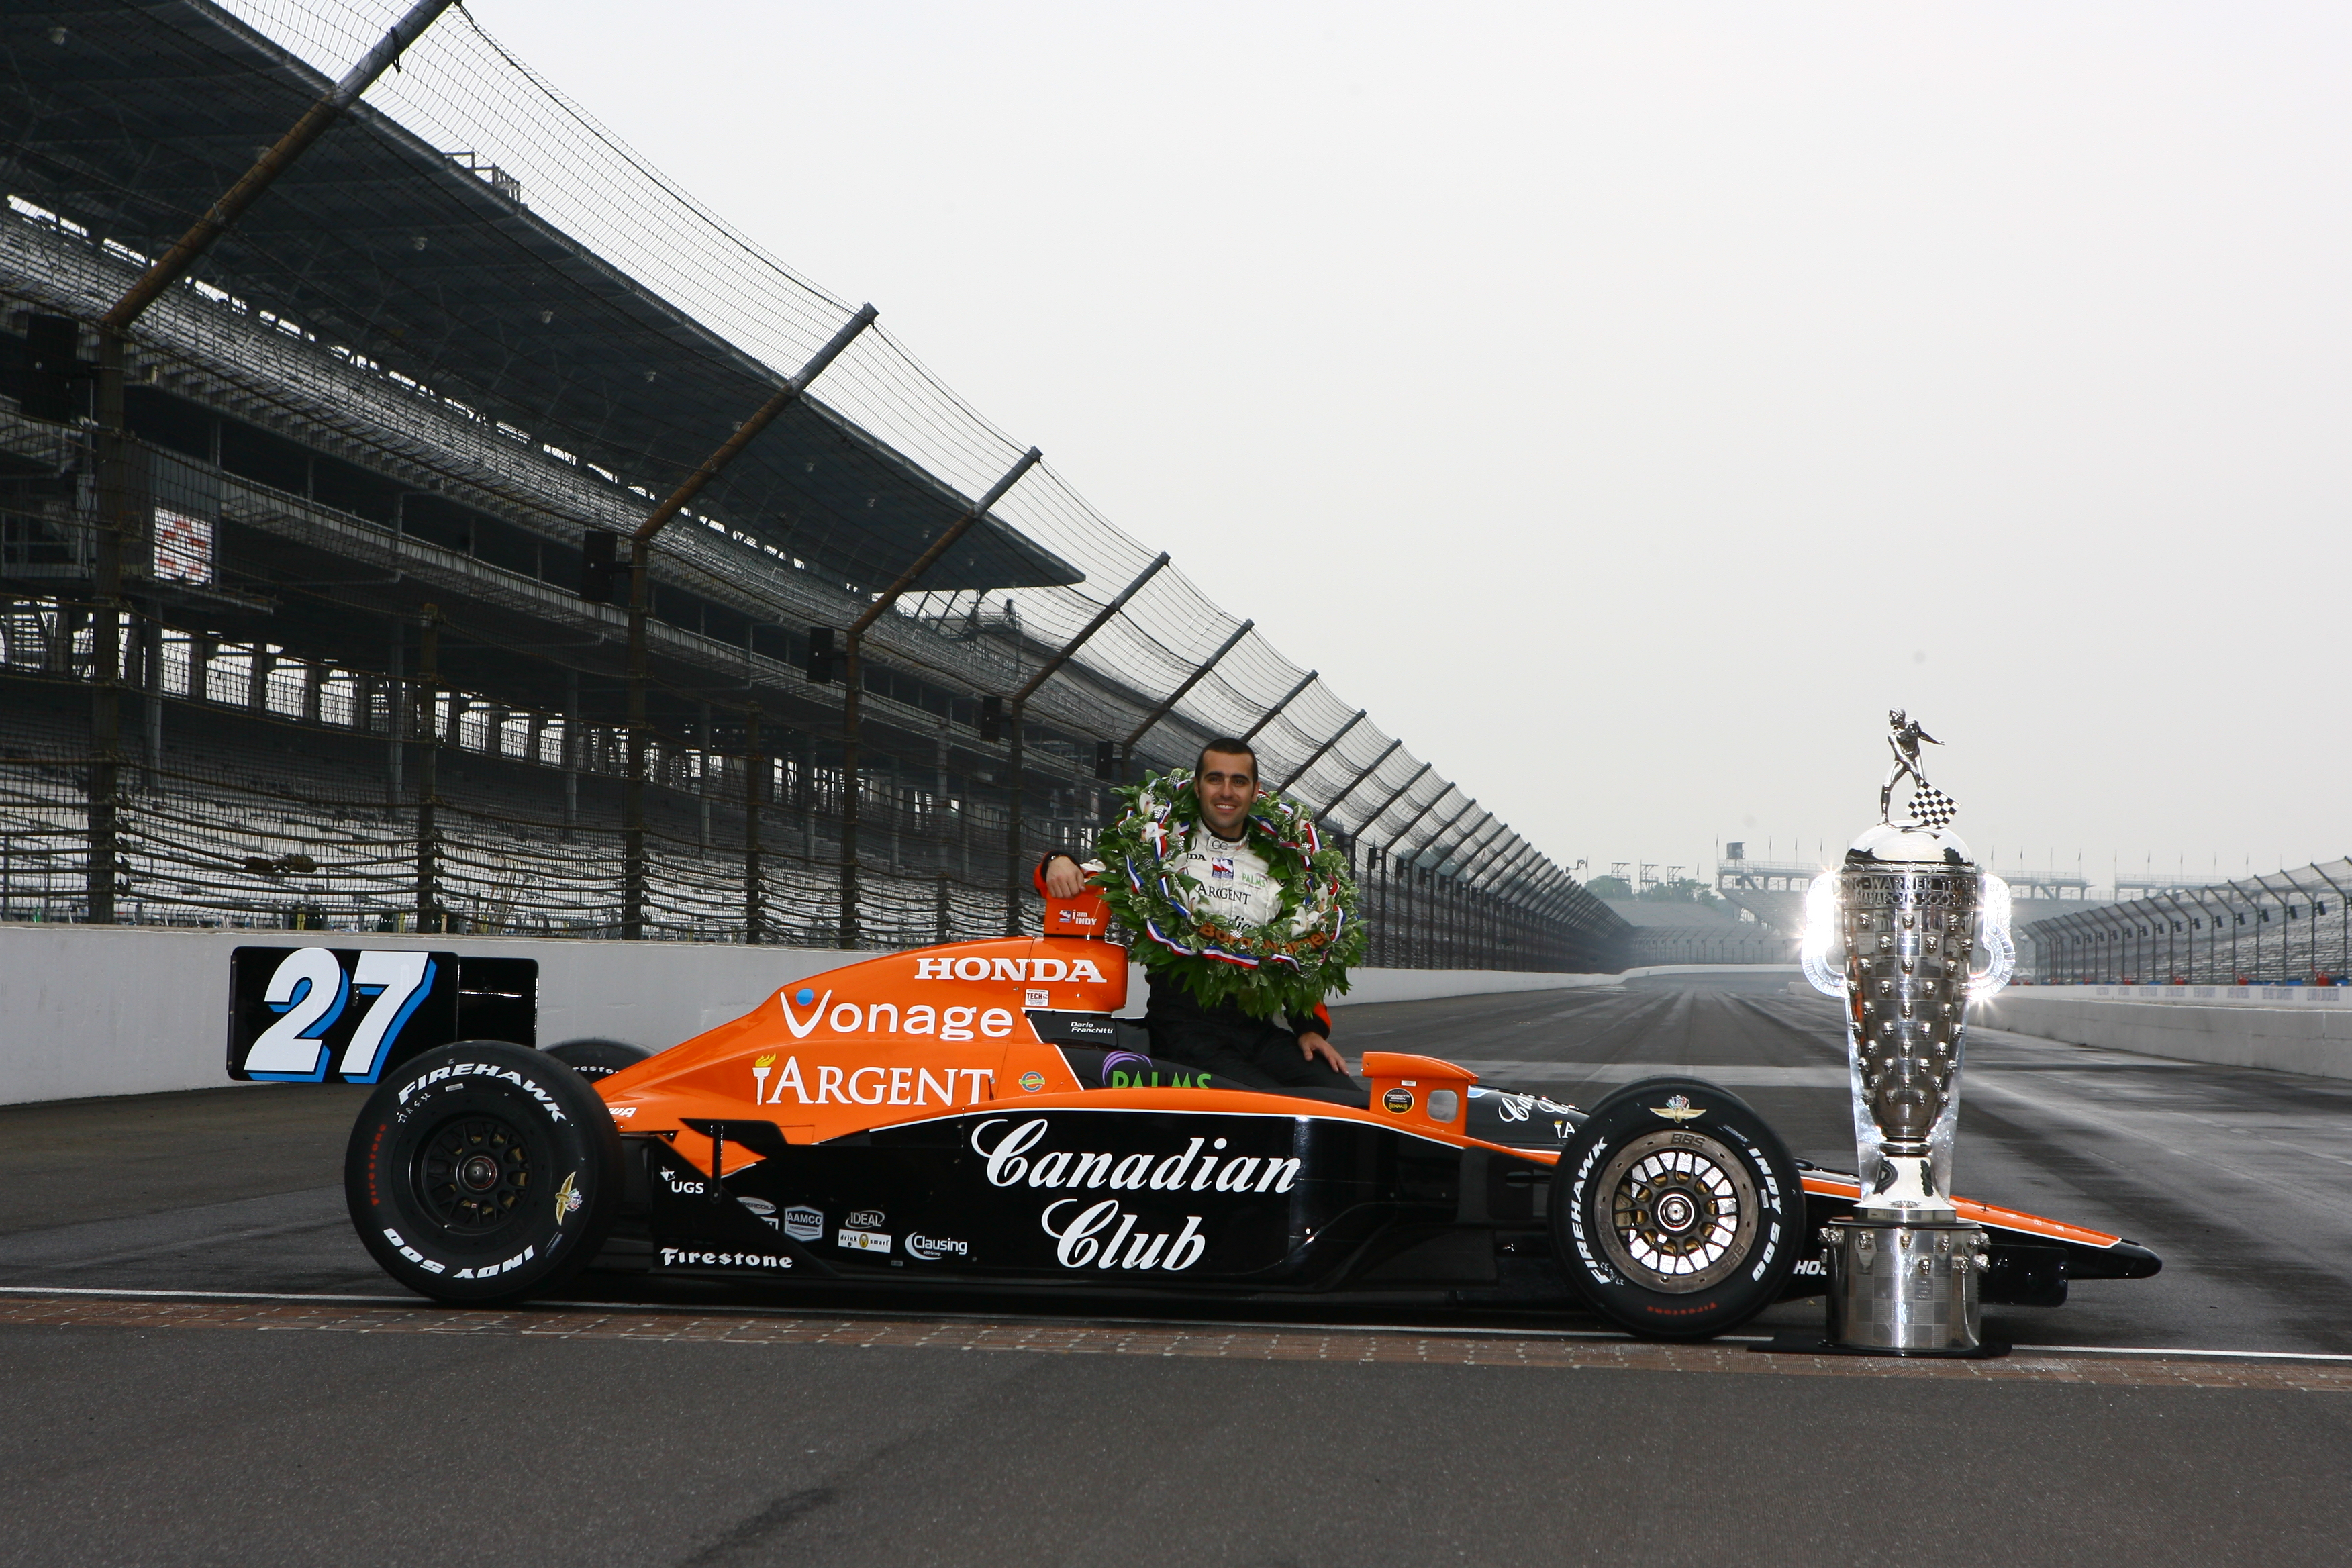 Dario Franchitti som seierherre i Indy 500 i 2007. Foto: Indianapolis Motor Speedway